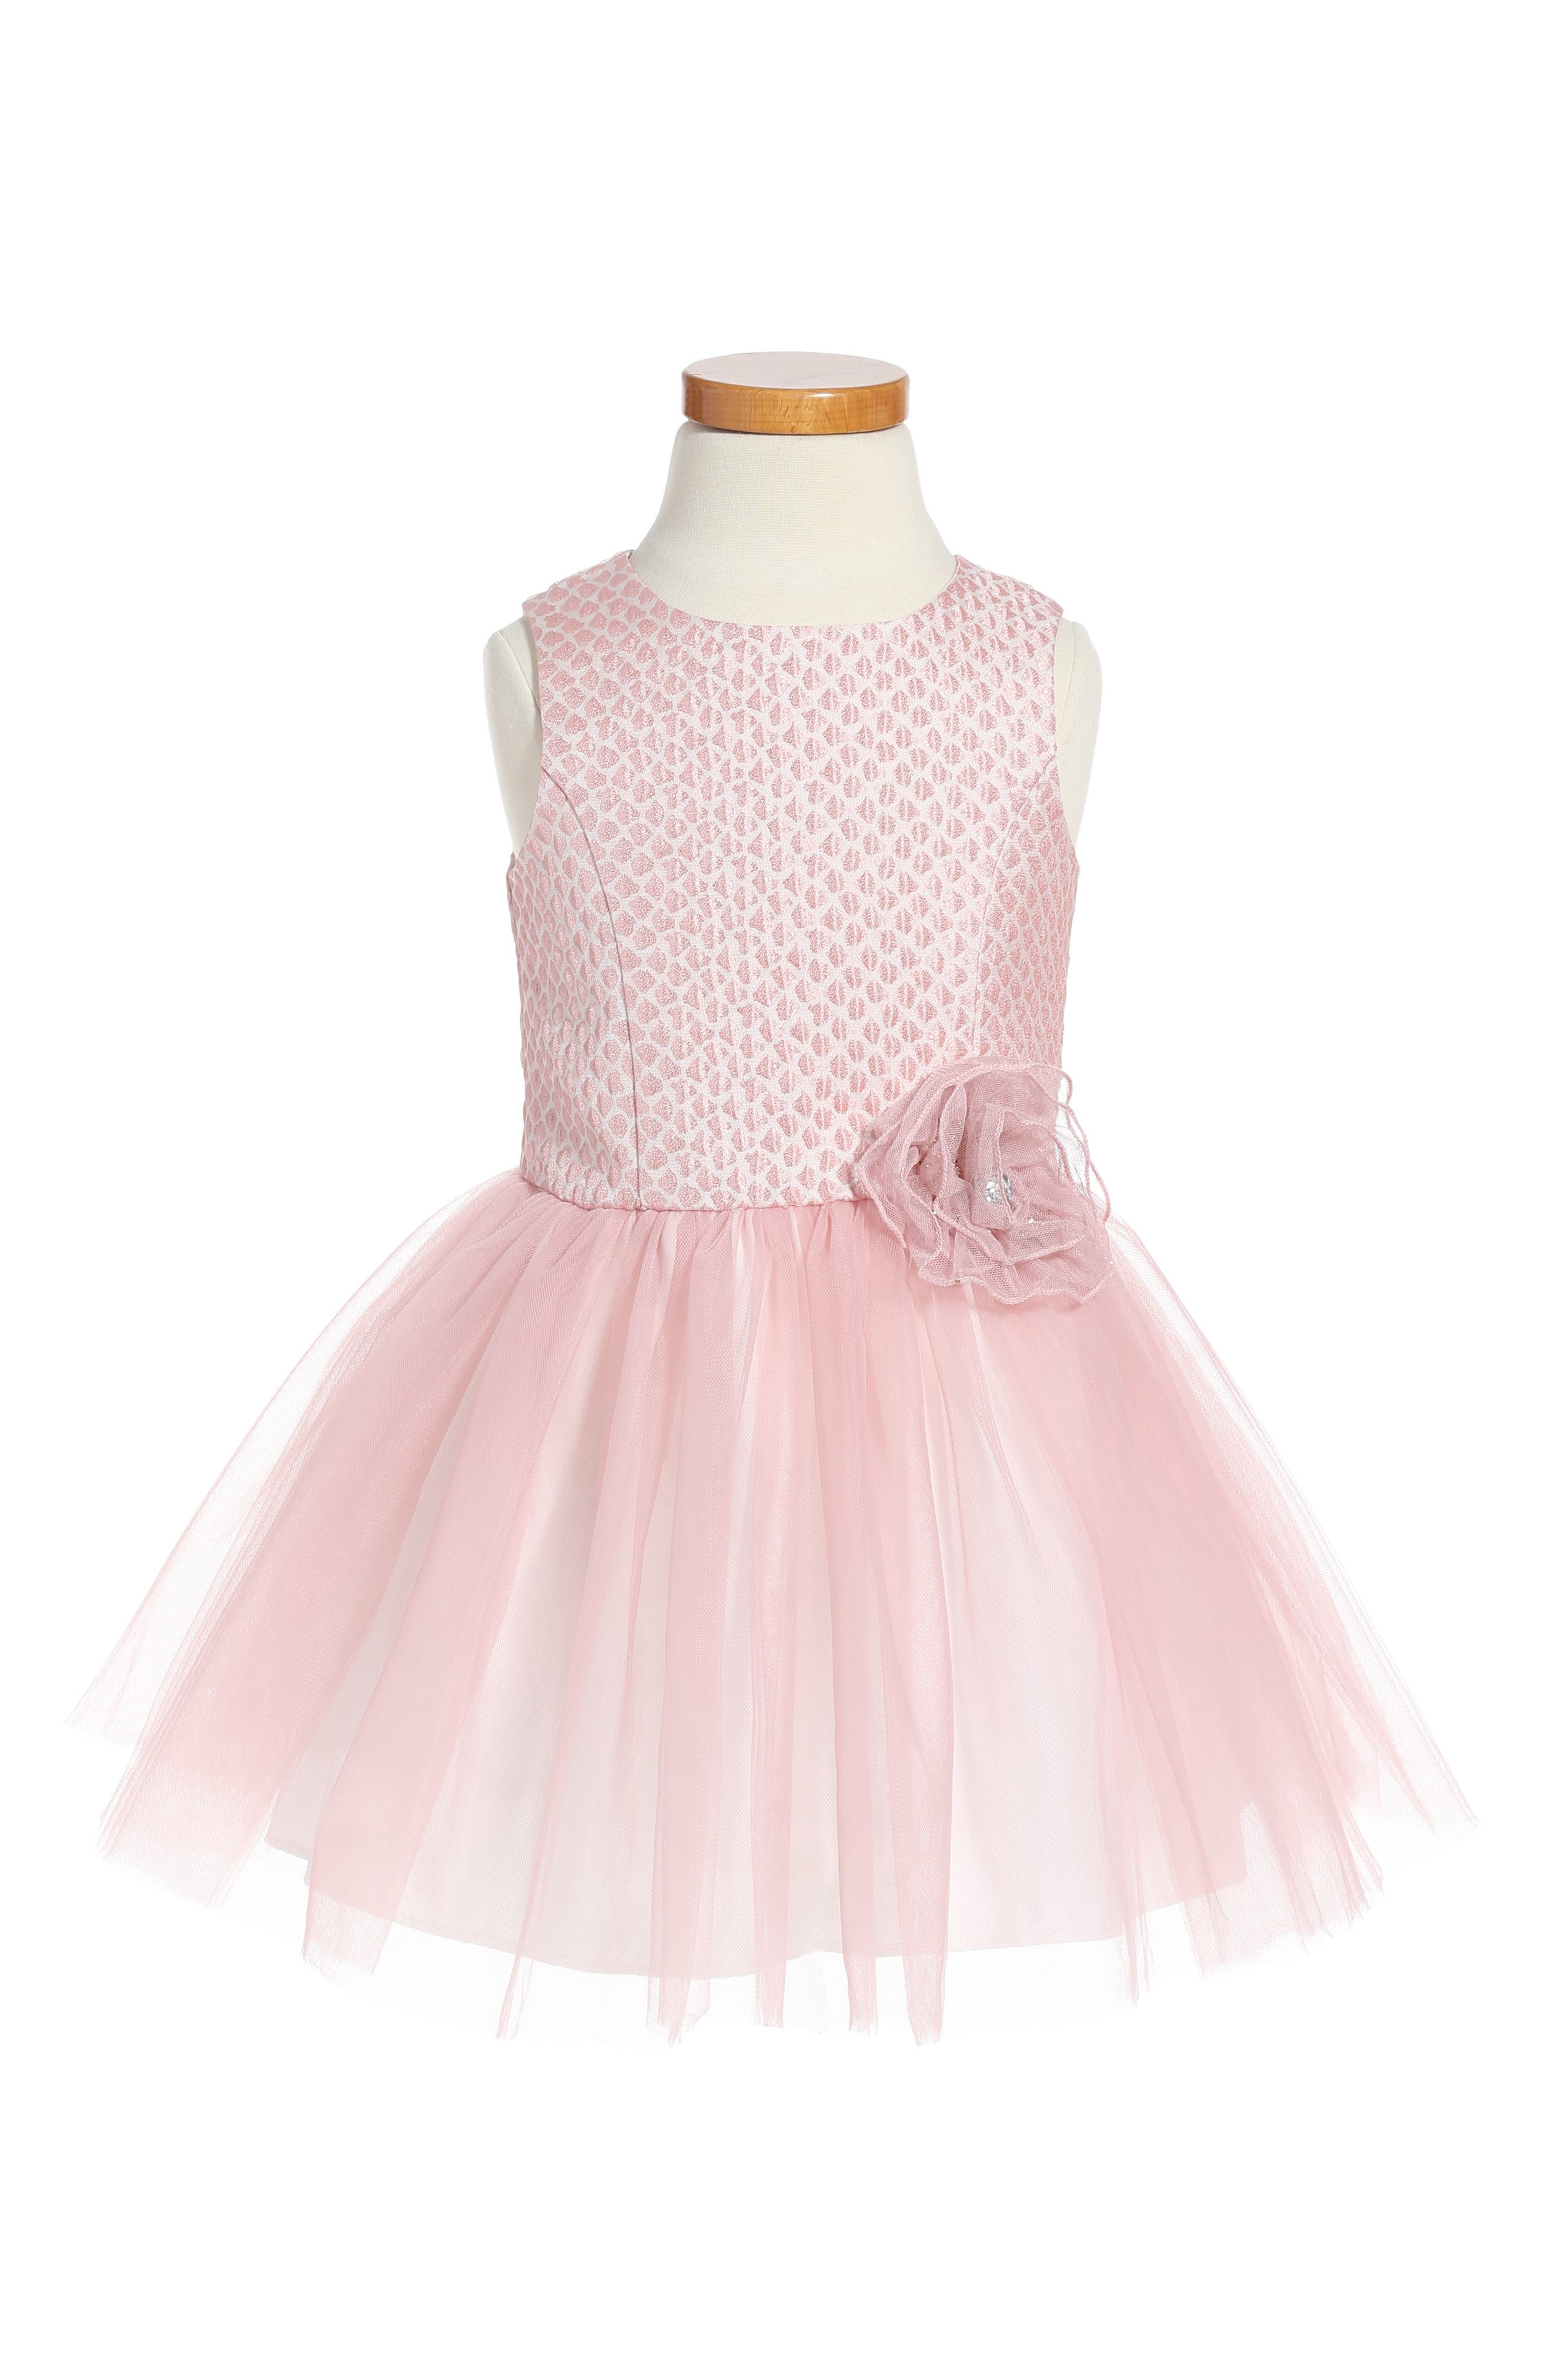 Alternate Image 1 Selected - Pippa & Julie Brocade & Tulle Dress (Toddler Girls & Little Girls)